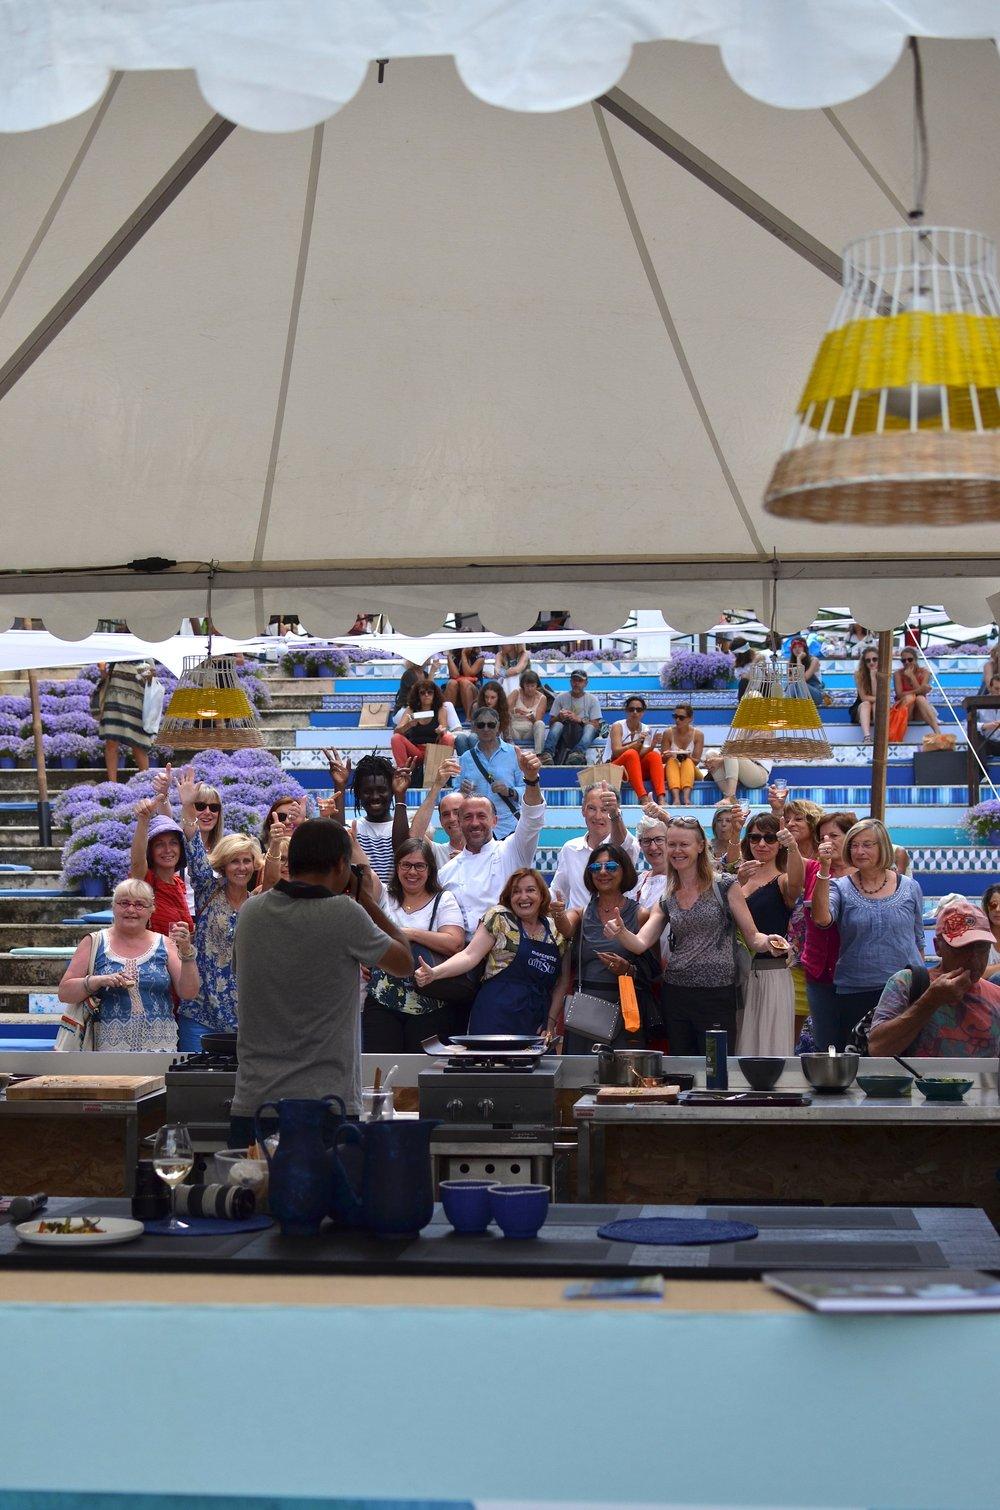 twinky lizzy blog aix en provence - cote sud 2017 17.jpg